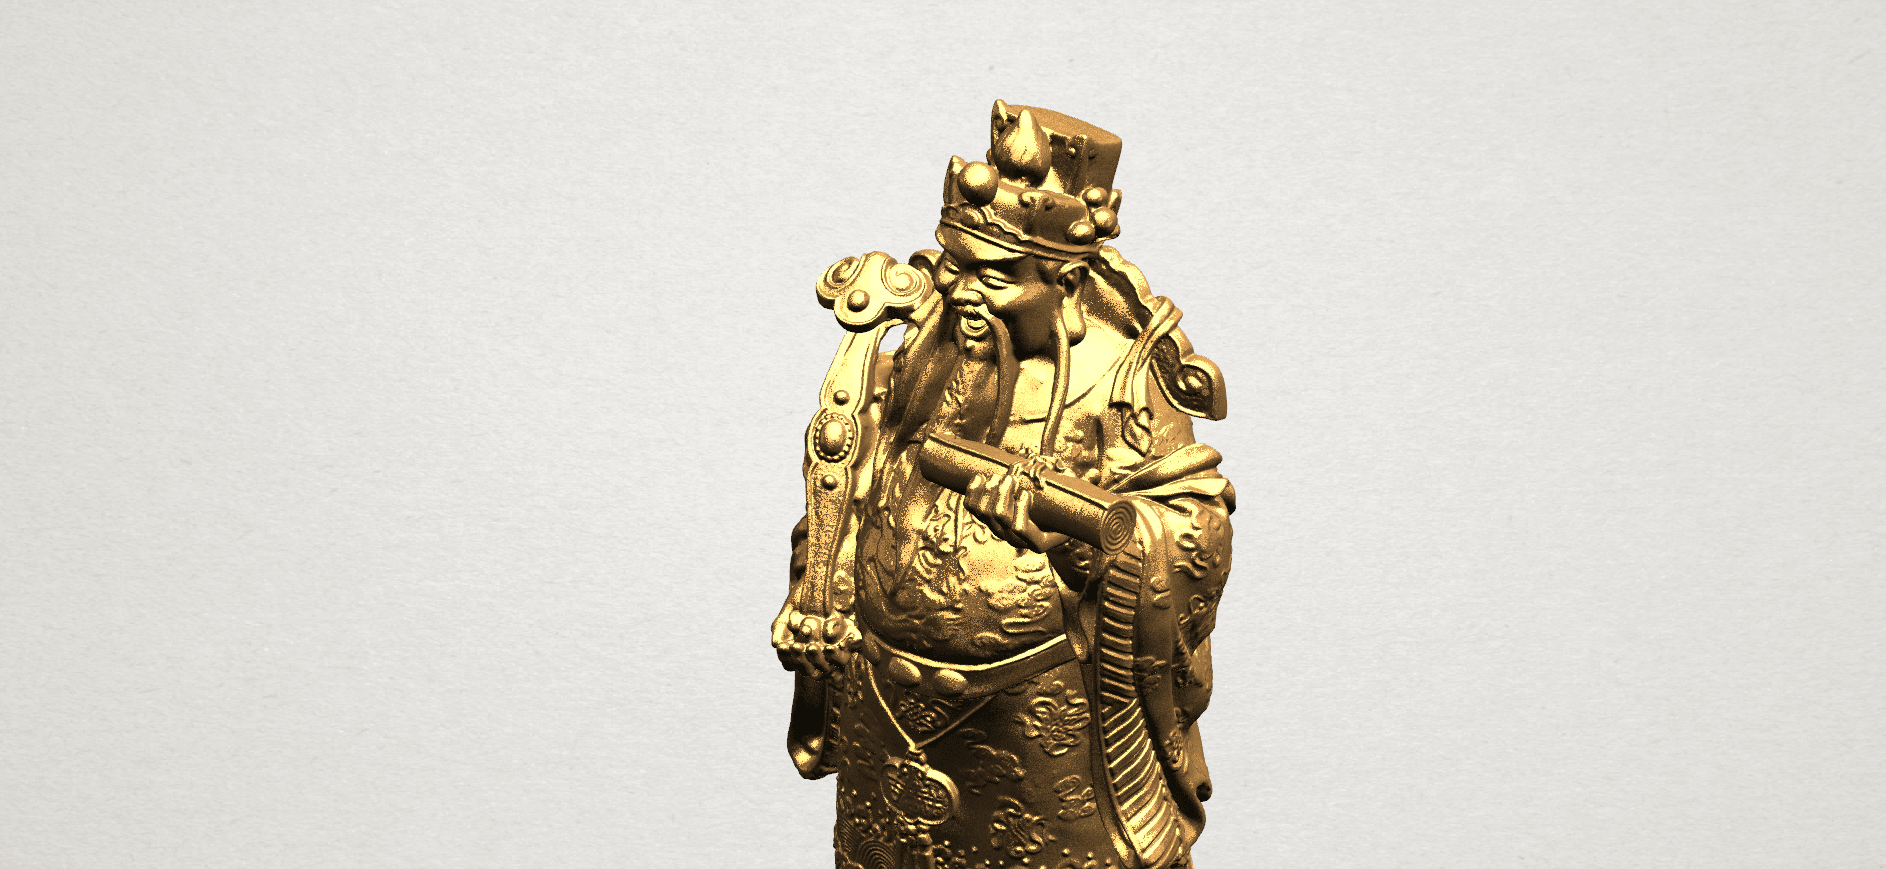 God of Treasure - B12.png Download free STL file God of Treasure • 3D printing model, GeorgesNikkei